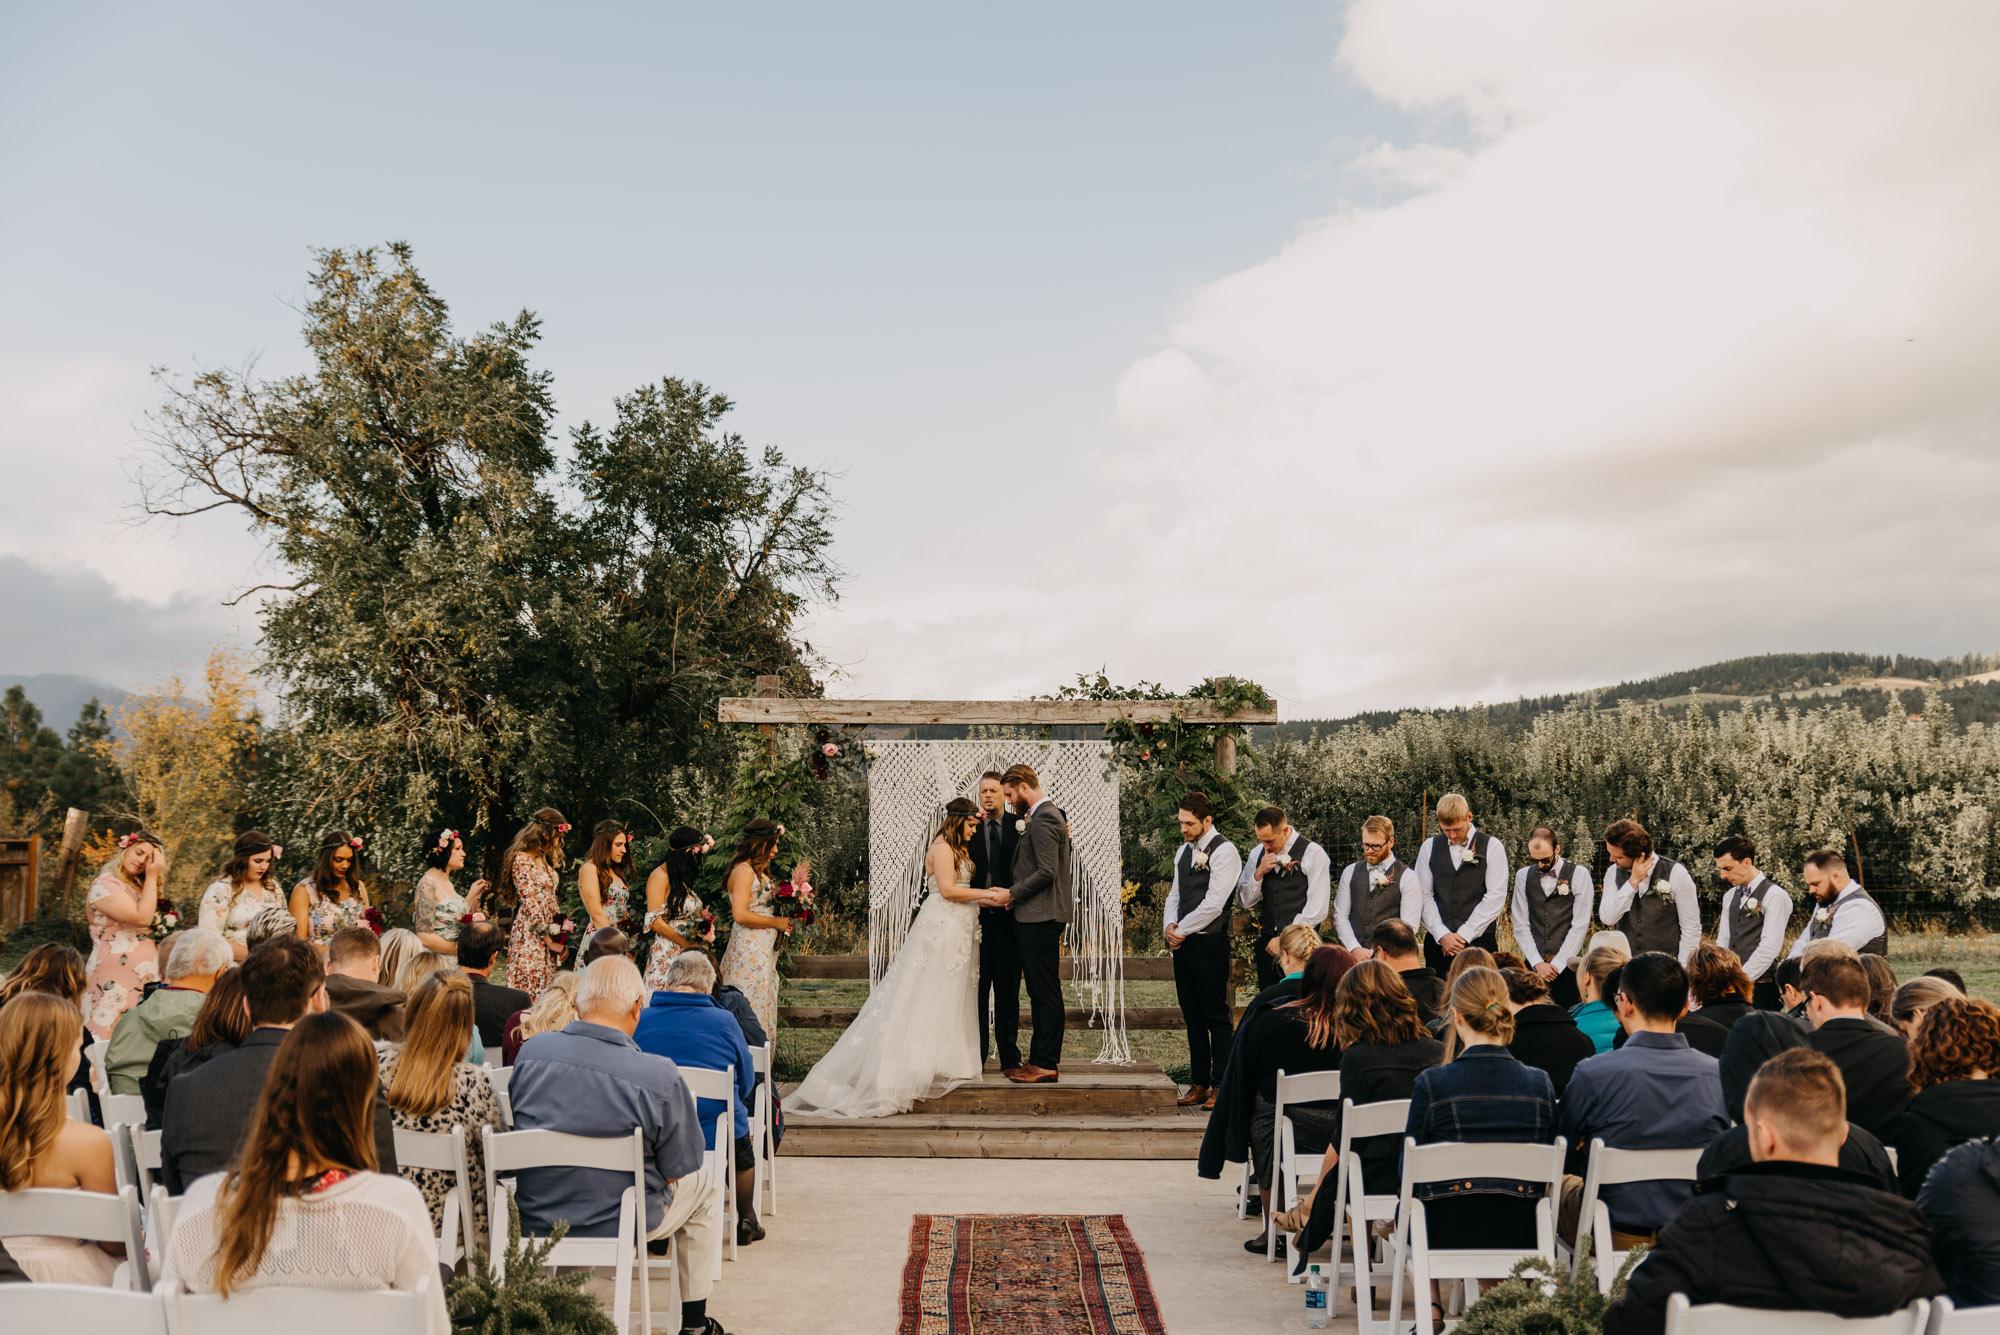 Outdoor-Summer-Ceremony-Washington-Wedding-Rainbow-5414.jpg